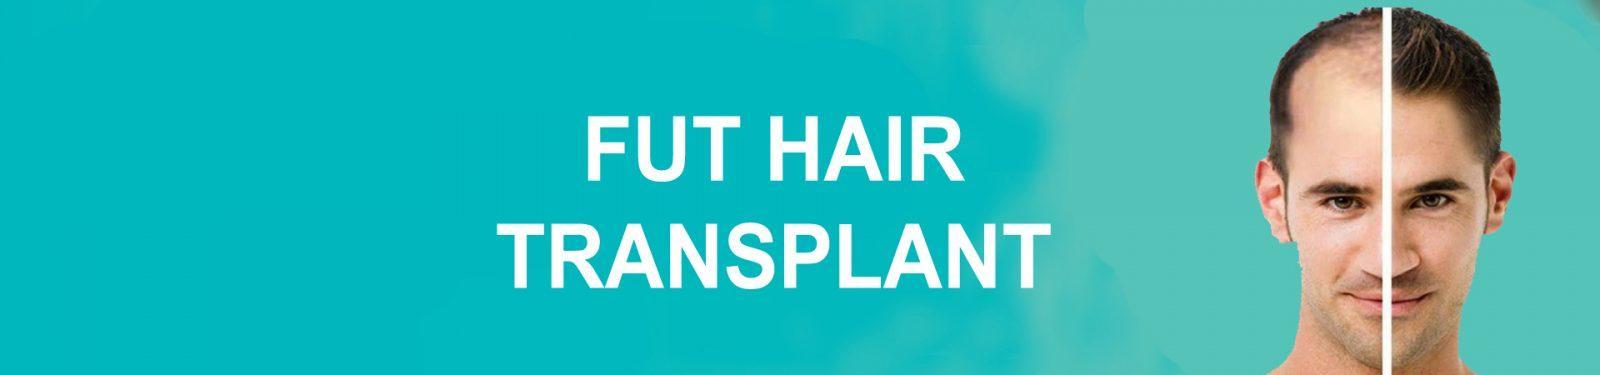 FUT HAIR TRANSPLANT 1 2 copy